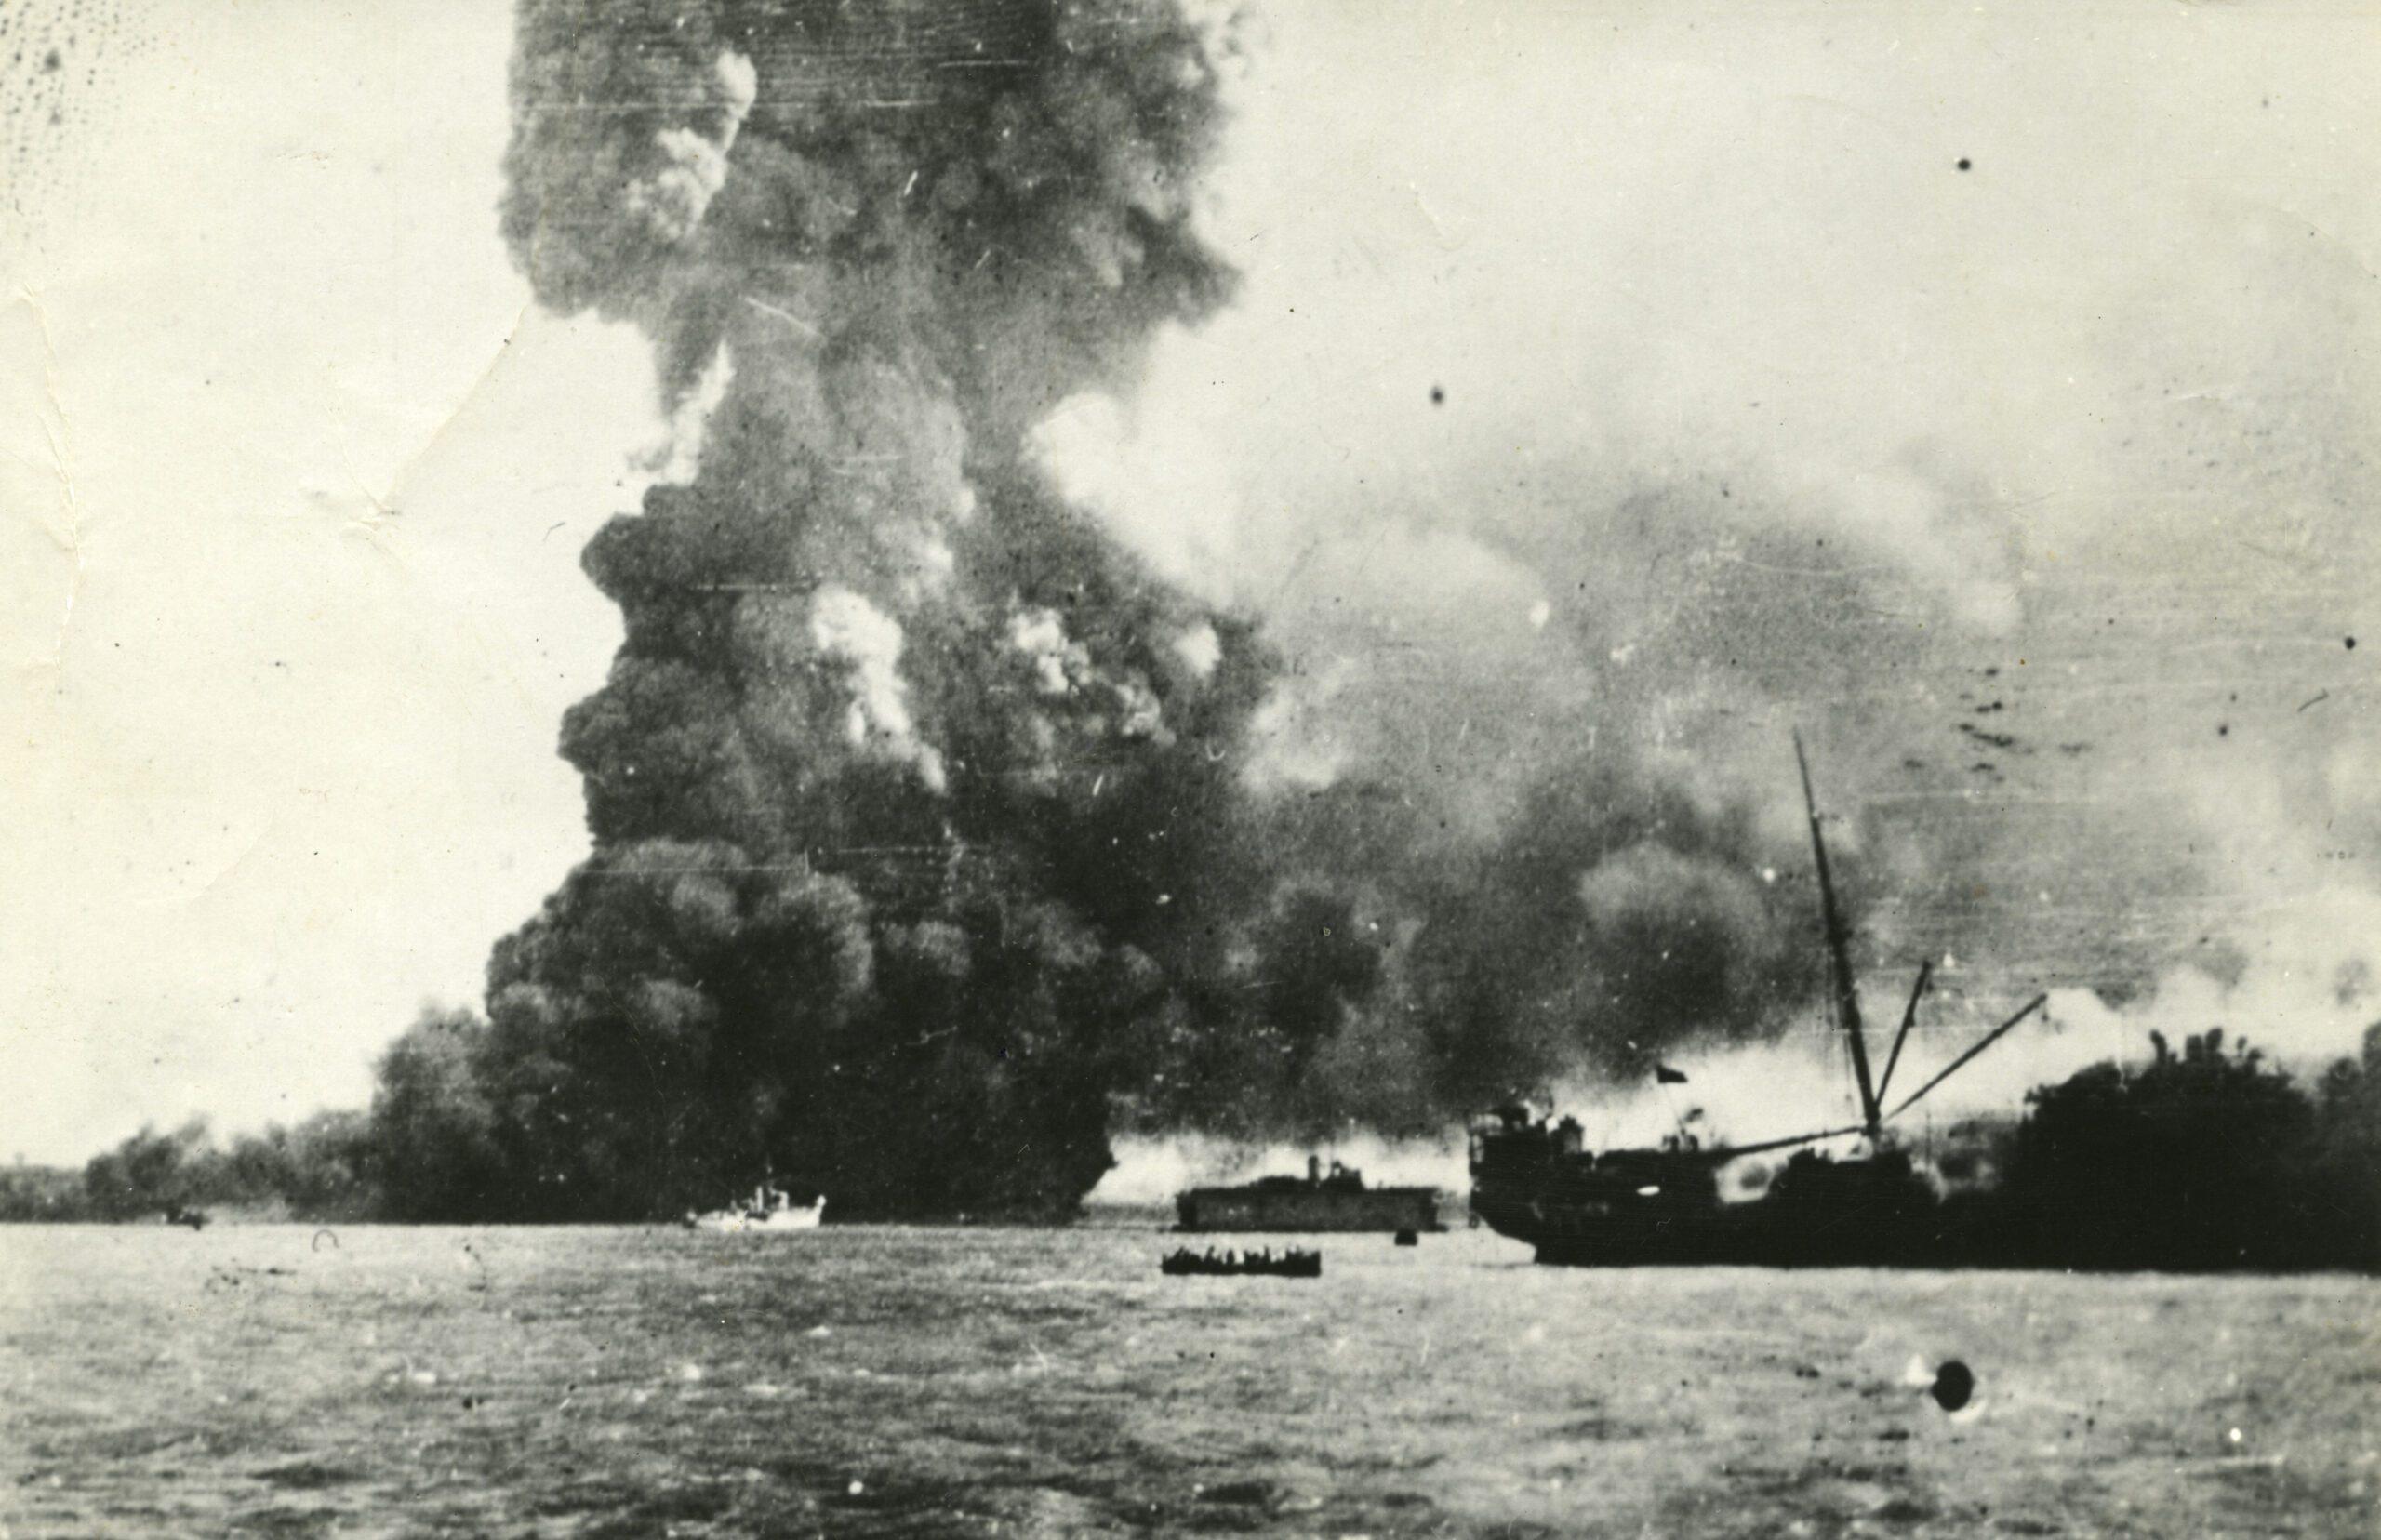 Remembering the bombing of Darwin